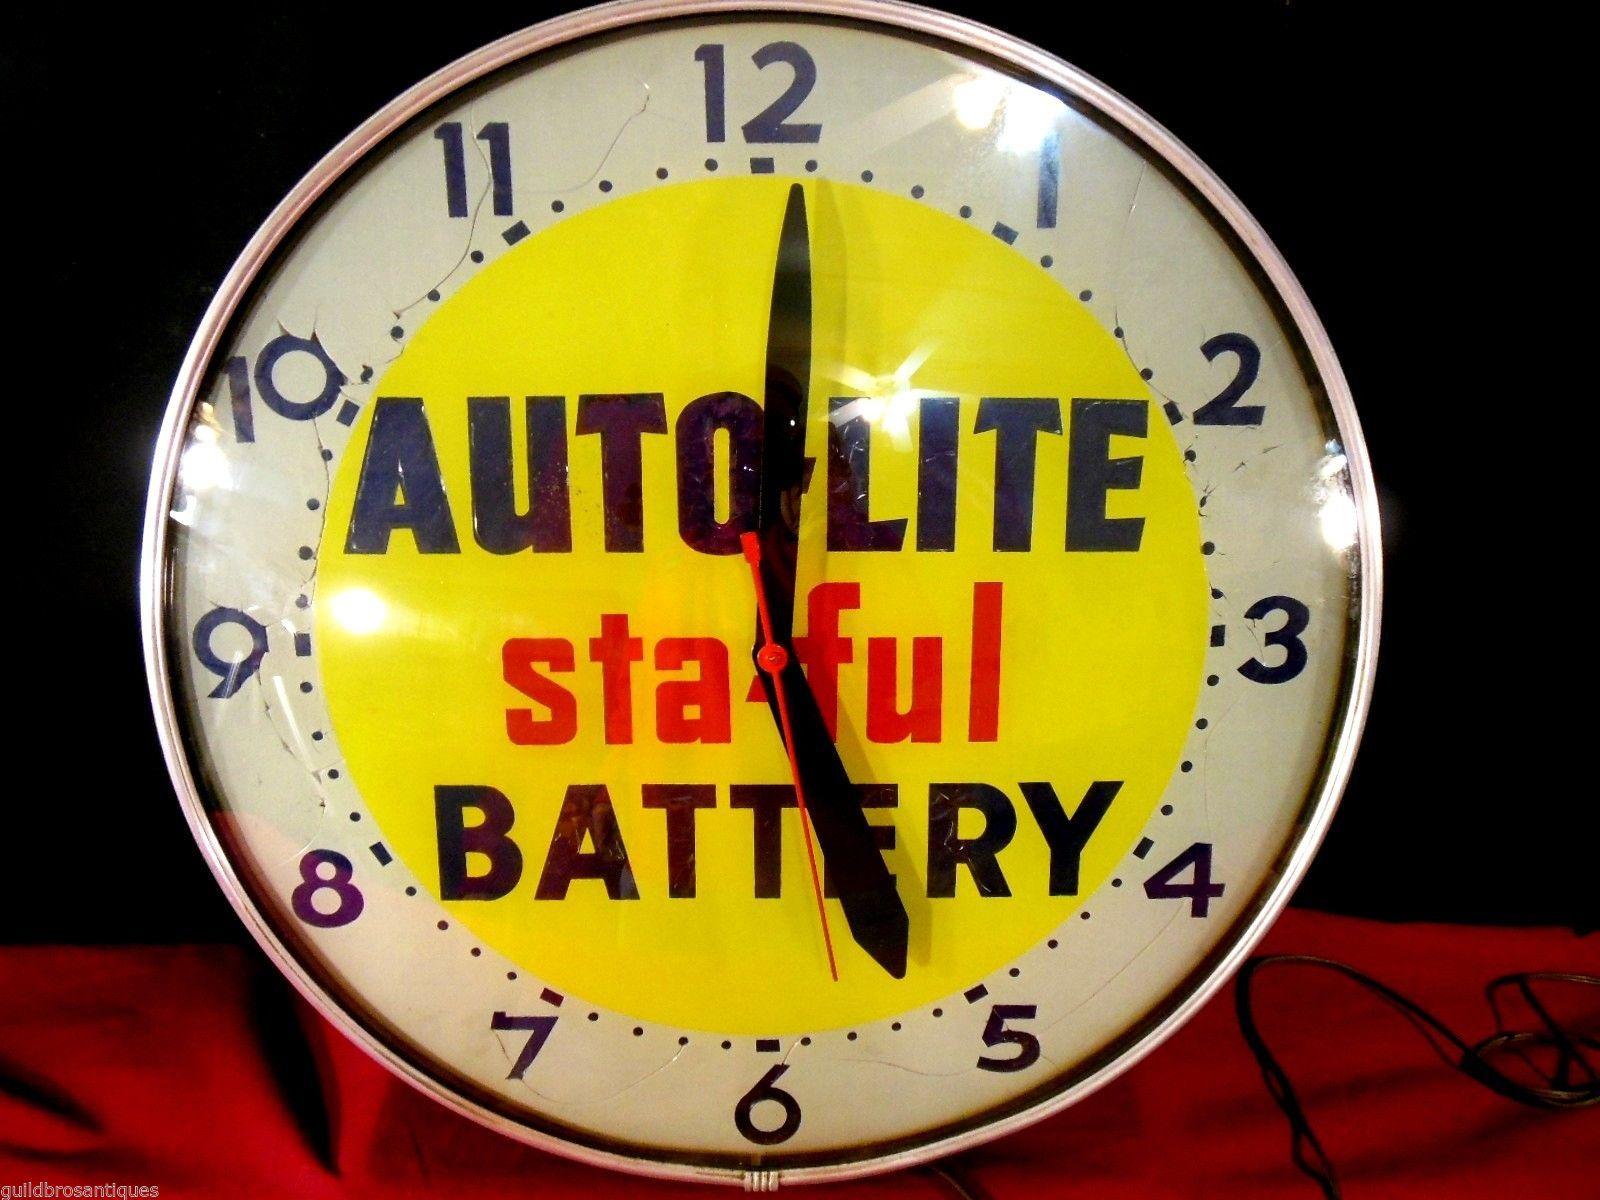 medium resolution of vintage auto lite battery clock antique 1940 sta ful automotive service station electric lighted advertising clock autolite